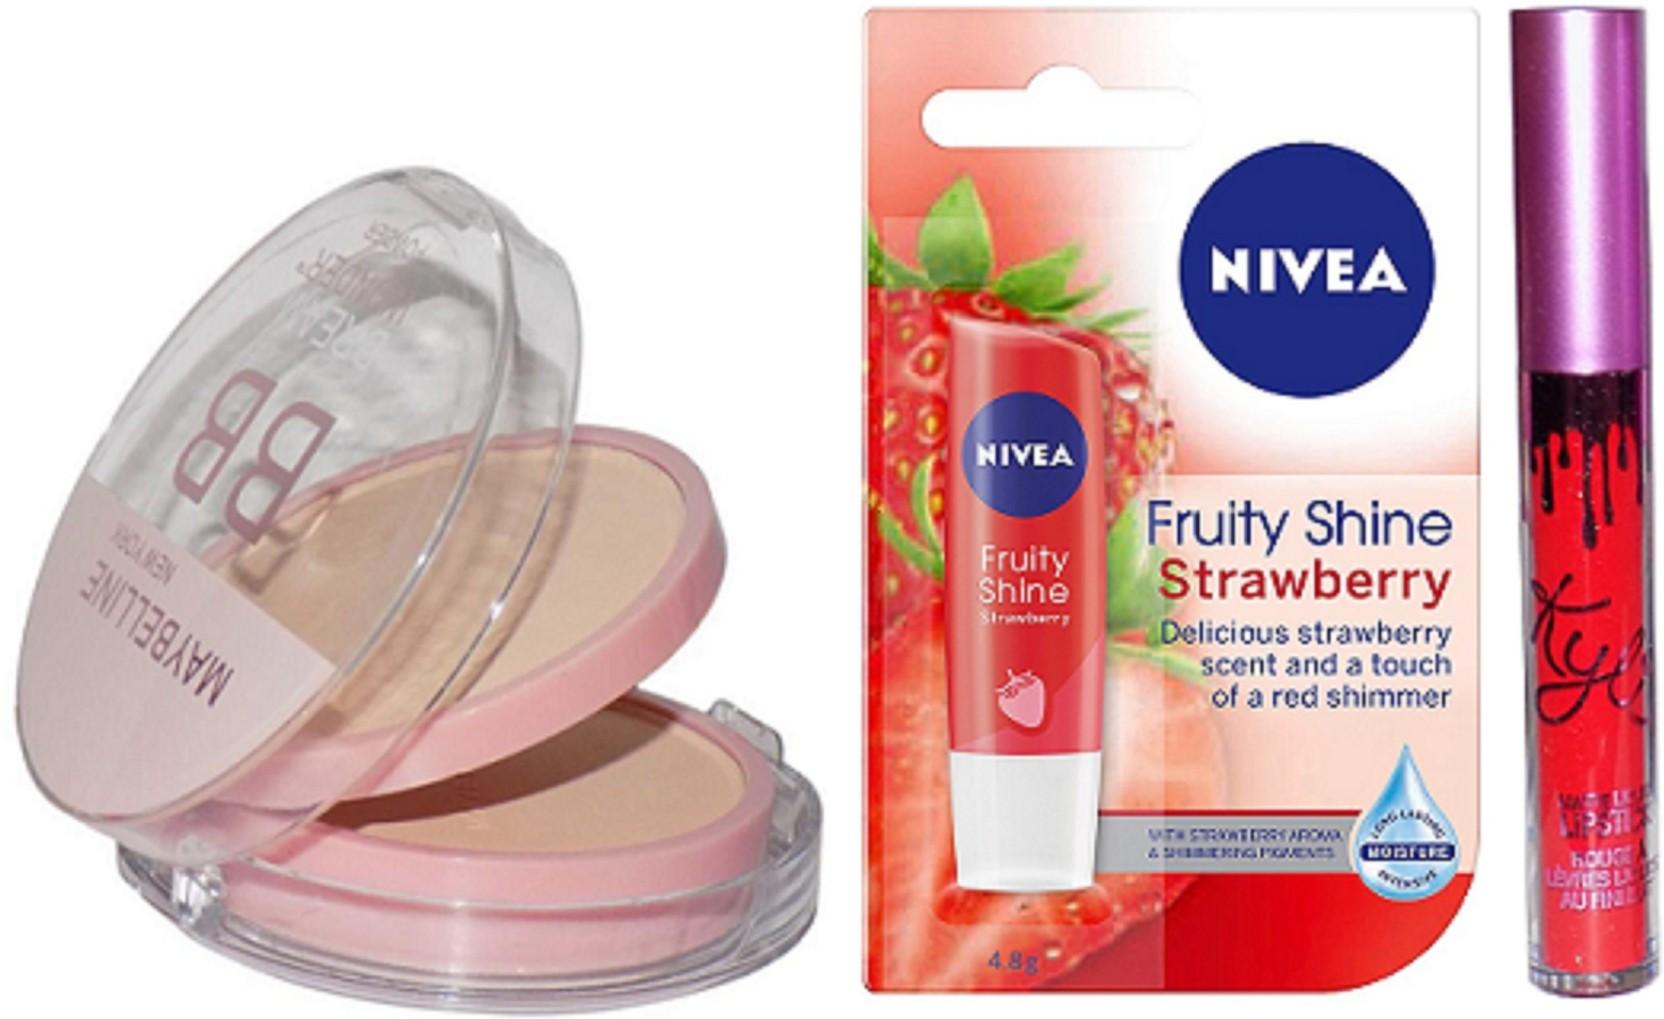 Maybelline Dream Bb Compact Nivea Strawberry Lip Balm Limited Shine Edition Gloss Share